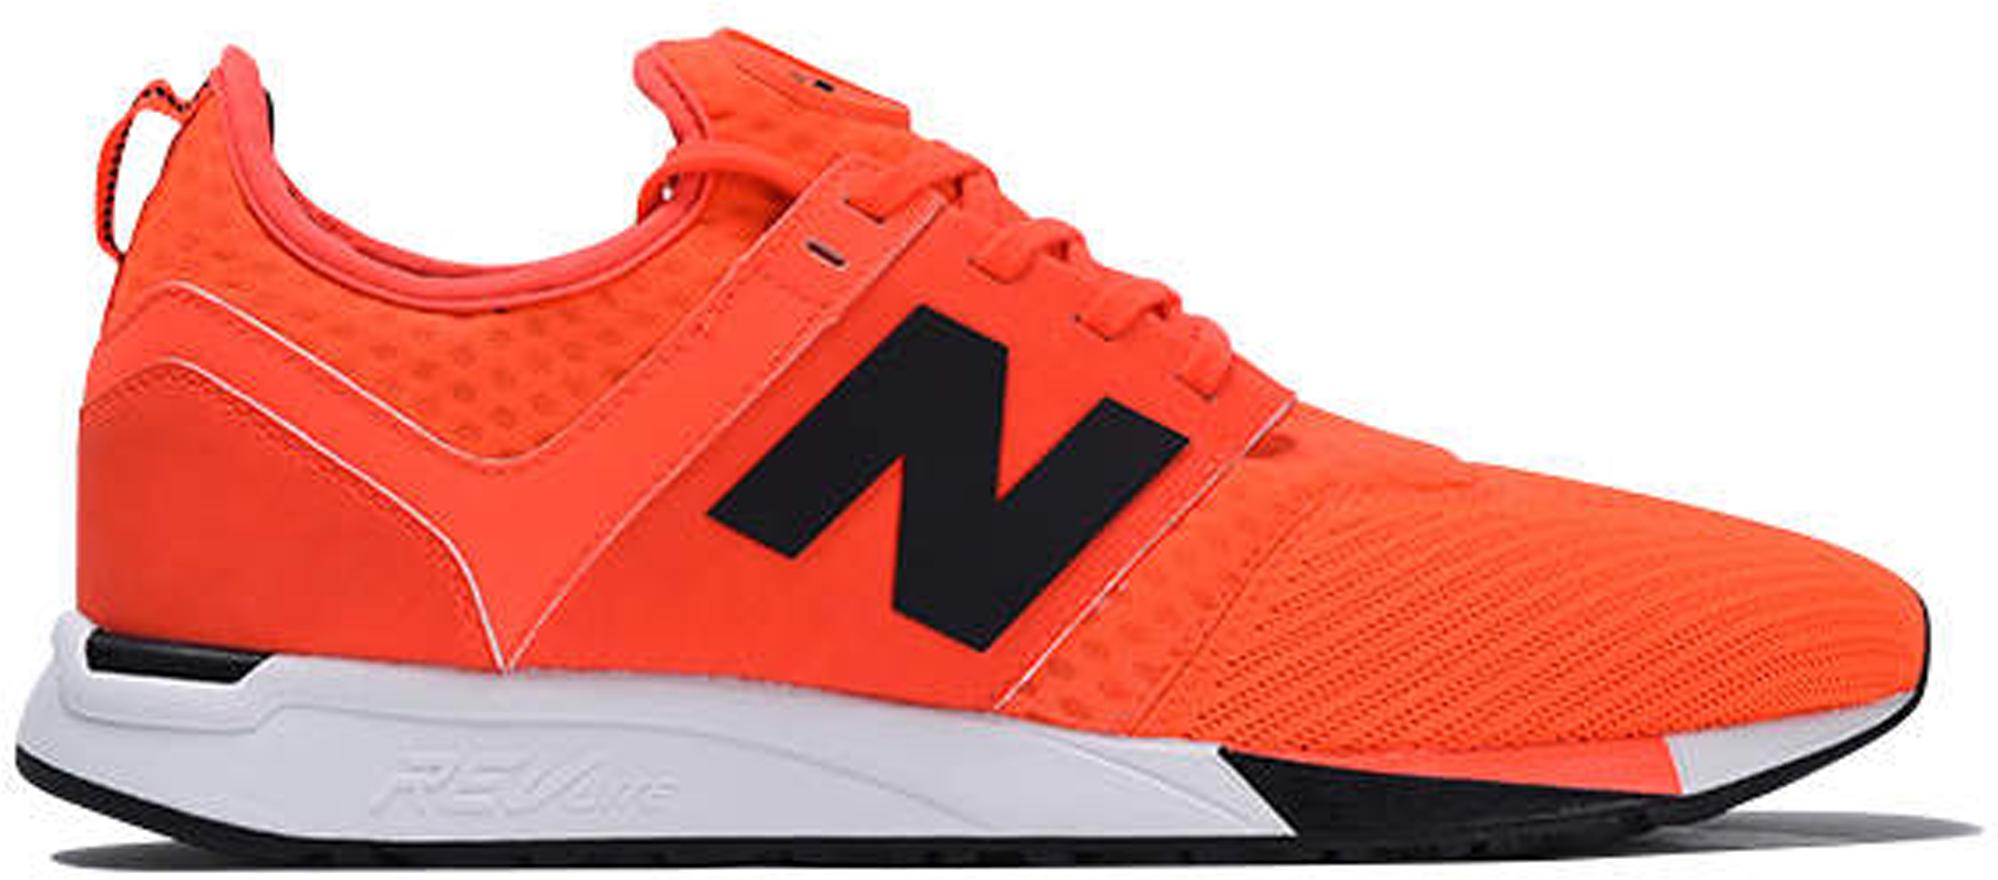 New Balance 247 Sport Orange In Orange/Black-White